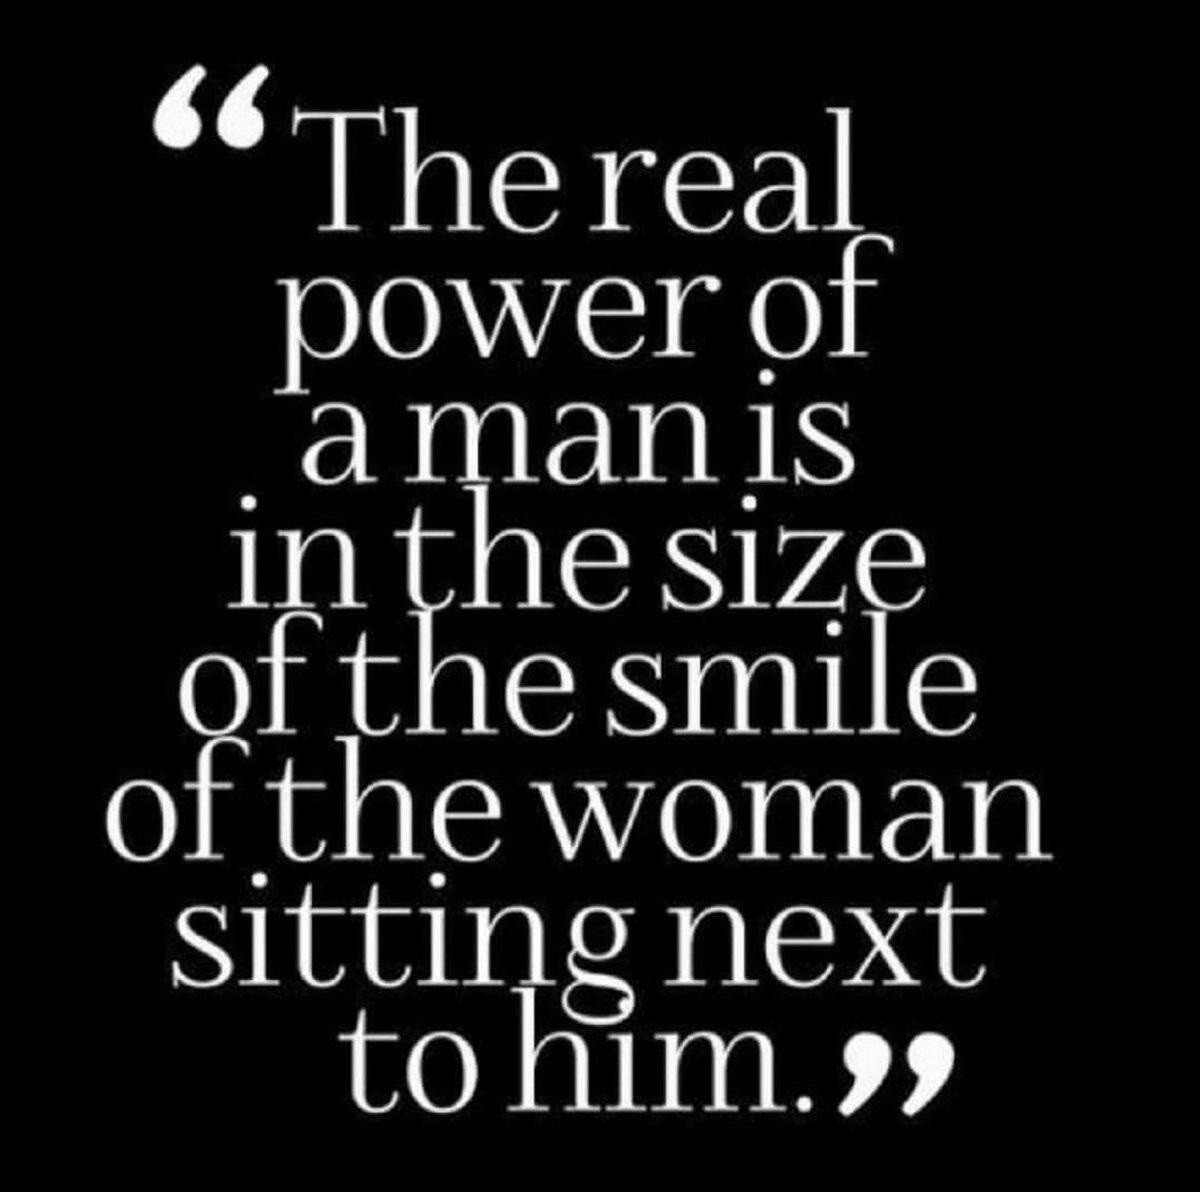 Make her smile everyday power man smile women relationship relationshipgoals single